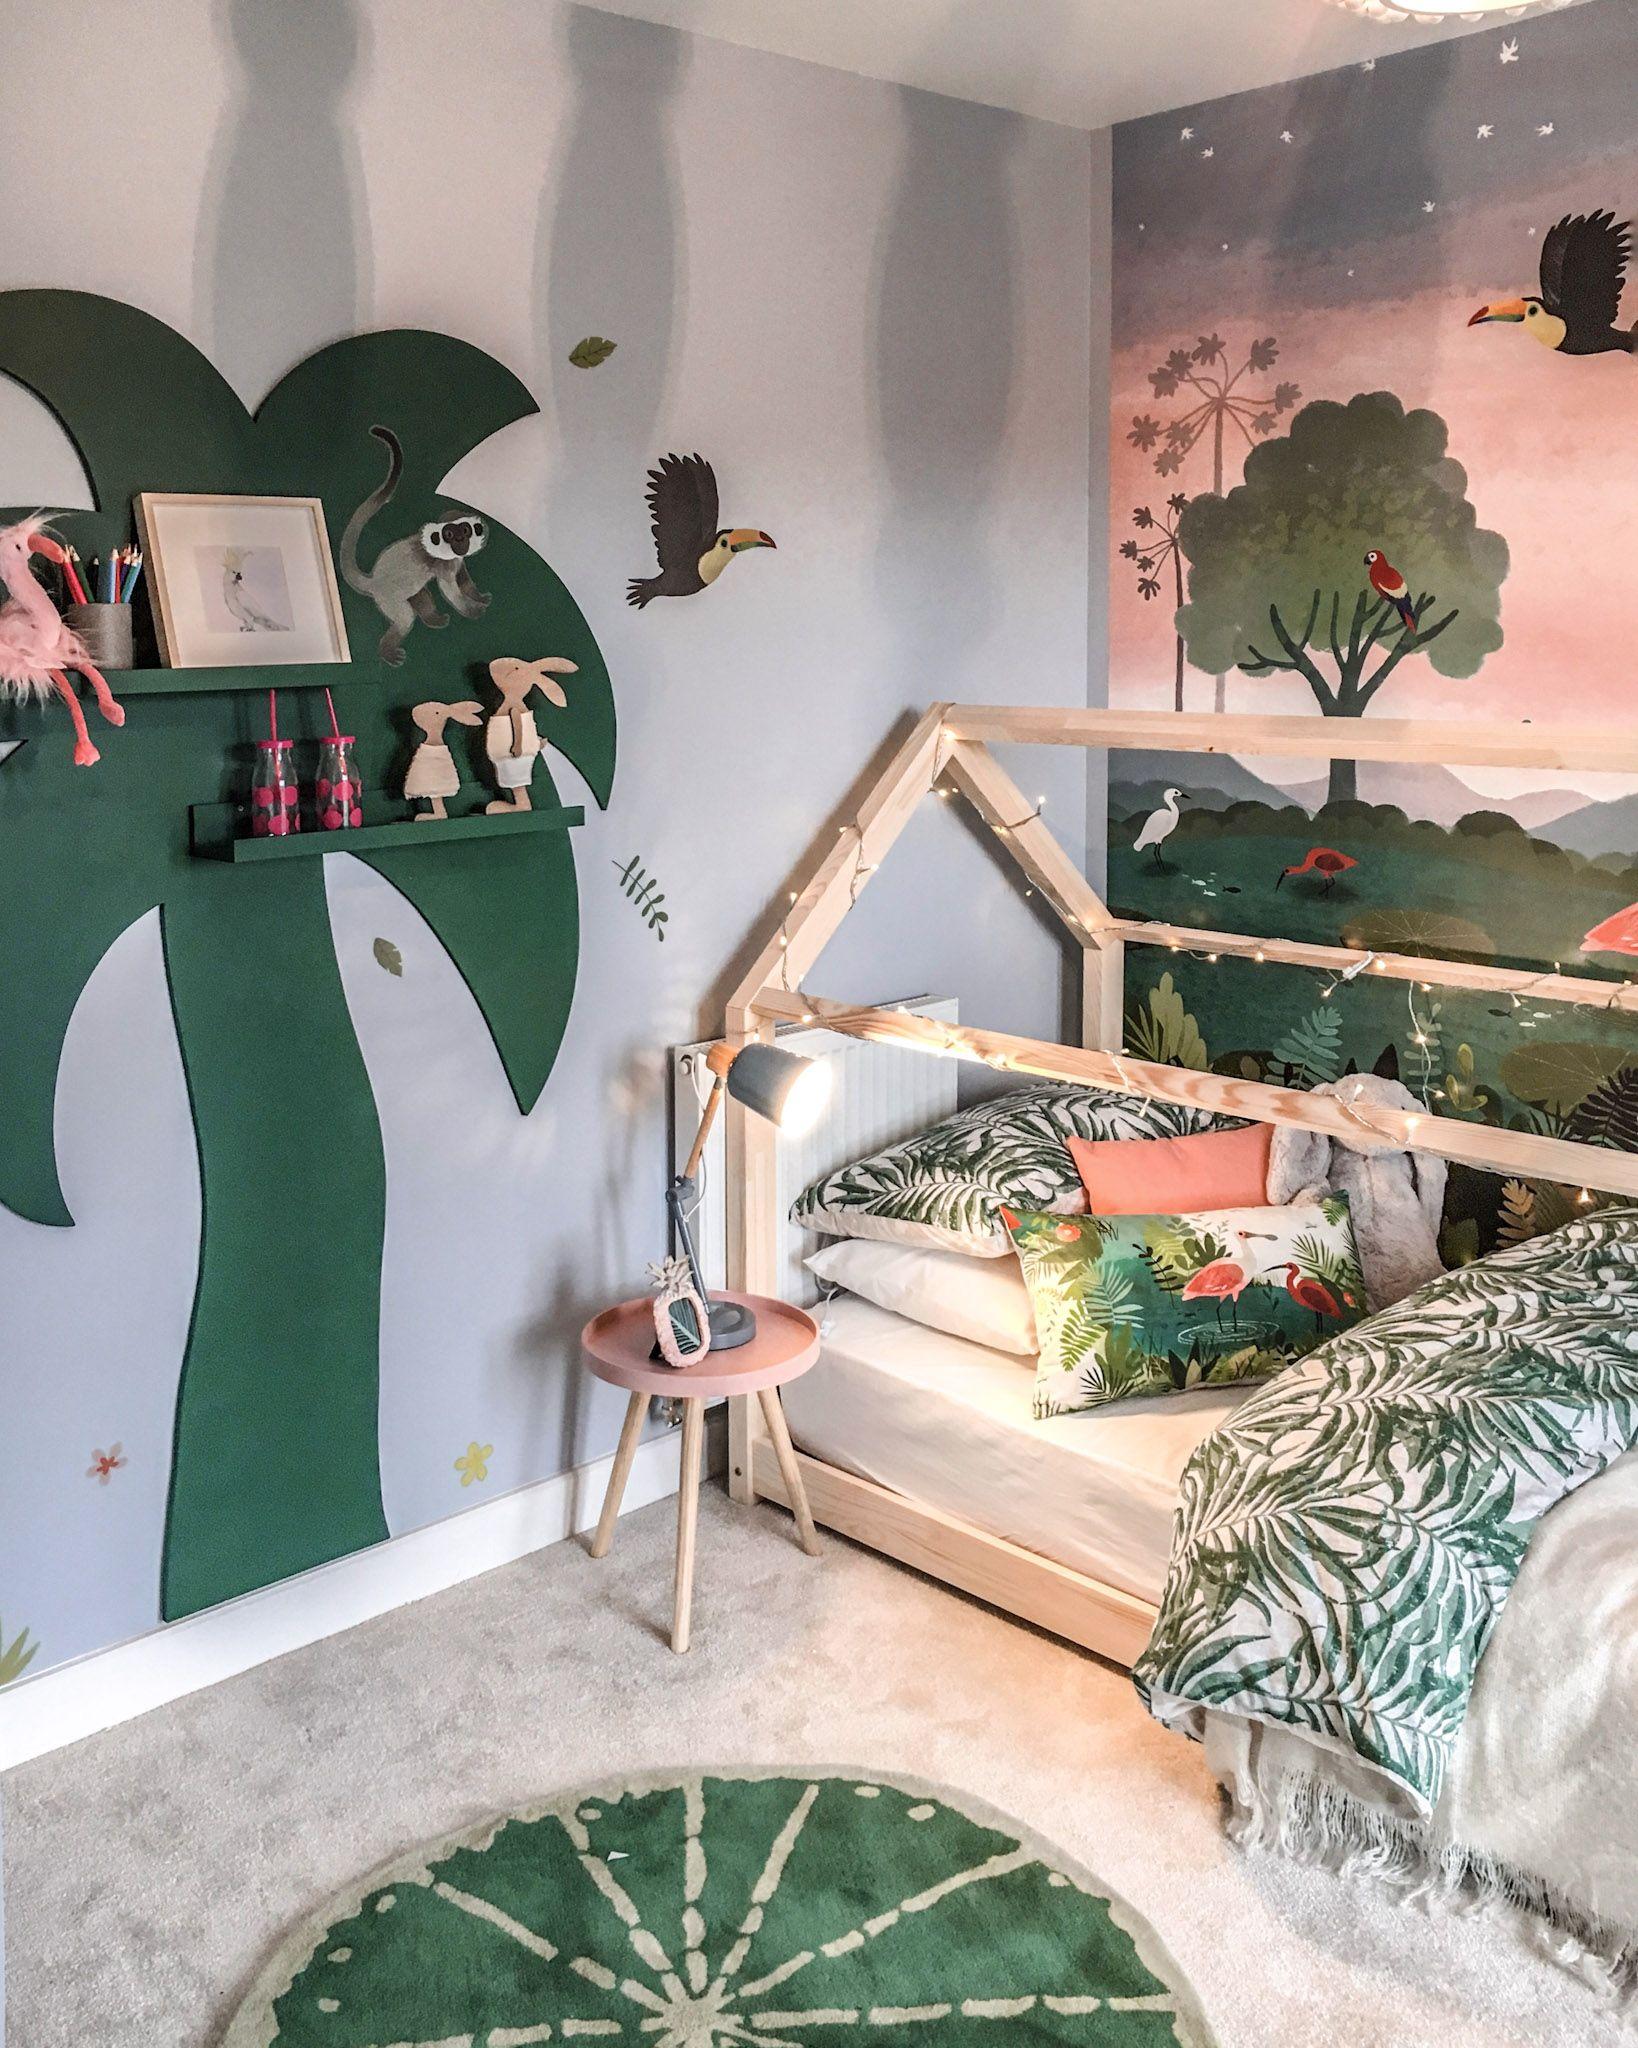 Jungle Kids Bedroom Bedroom Themes Toddler Boy Room Themes Jungle Bedroom Theme Top kids room themes